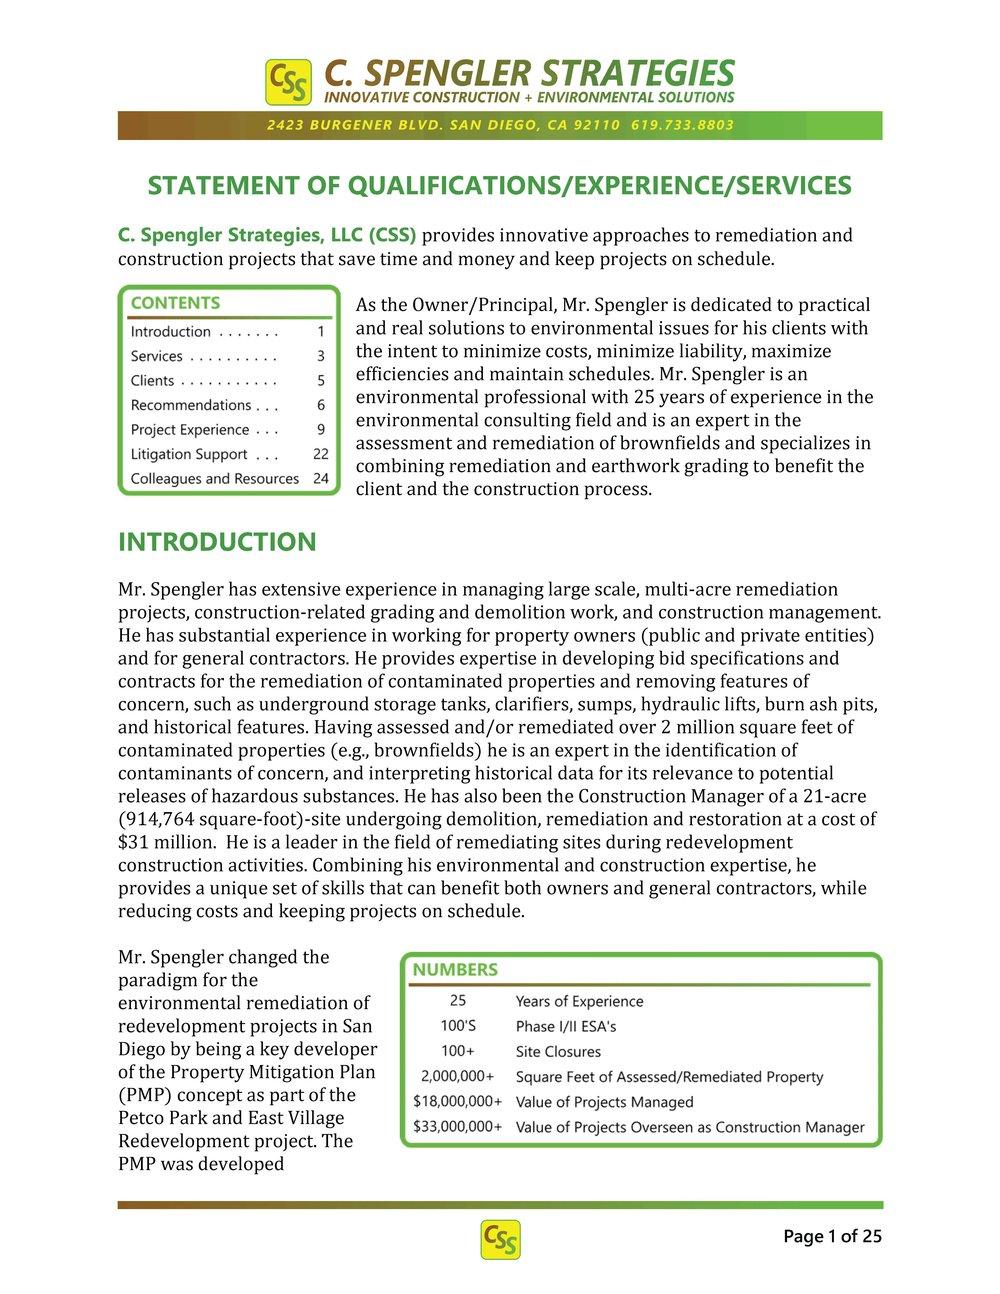 C.Spengler Strategies SOQ.2.13.18_Page_02.jpg